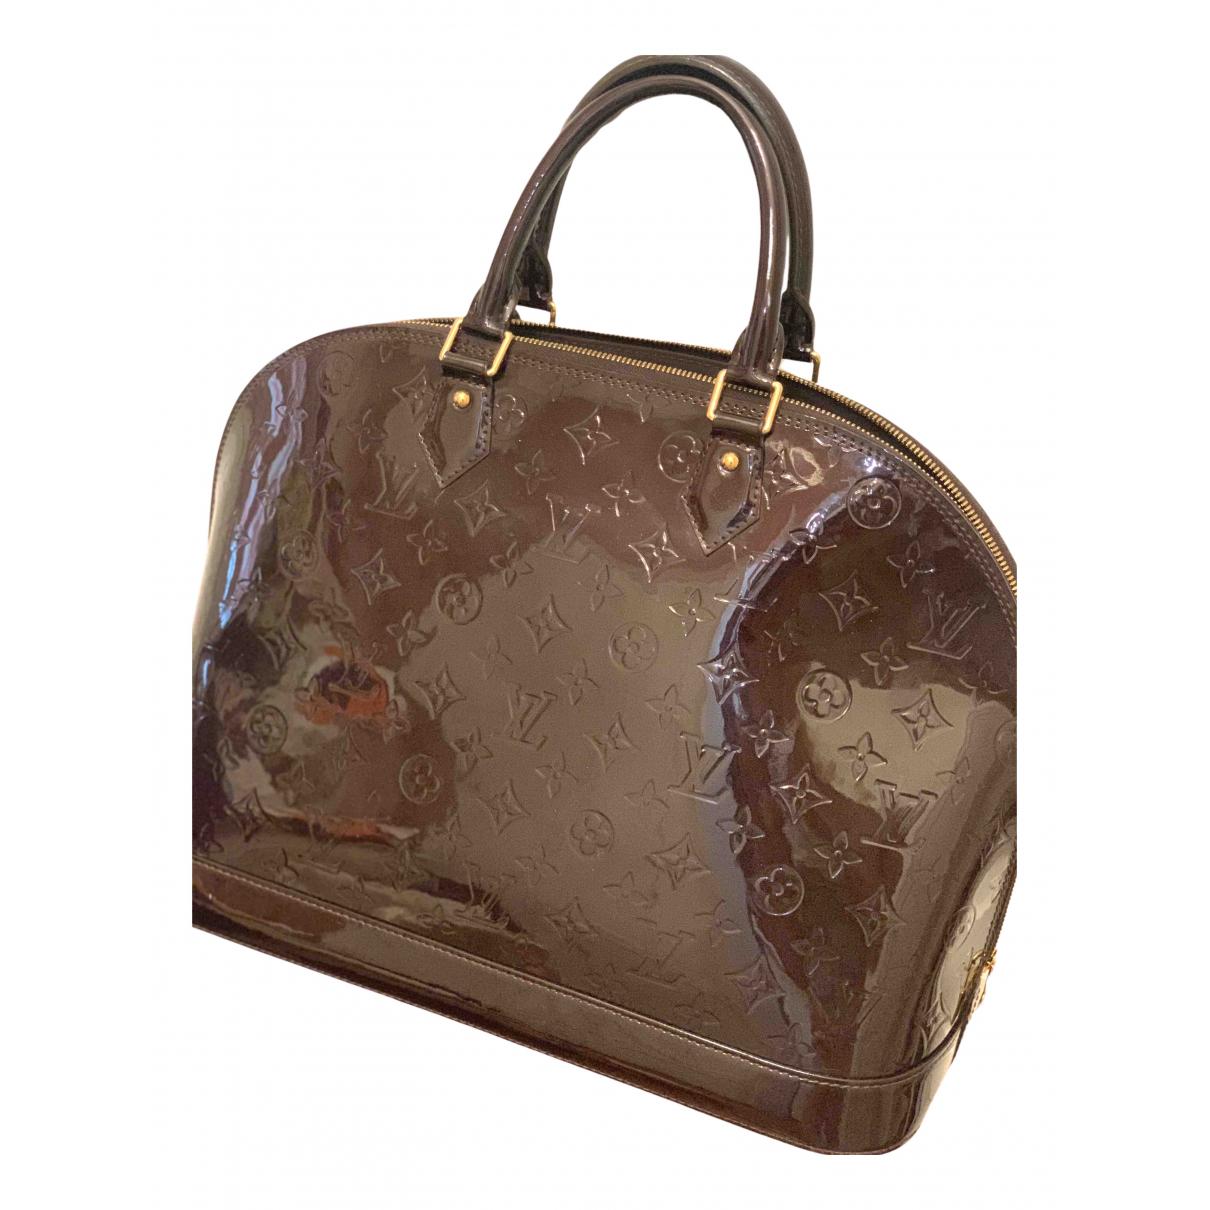 Louis Vuitton Alma Burgundy Patent leather handbag for Women N